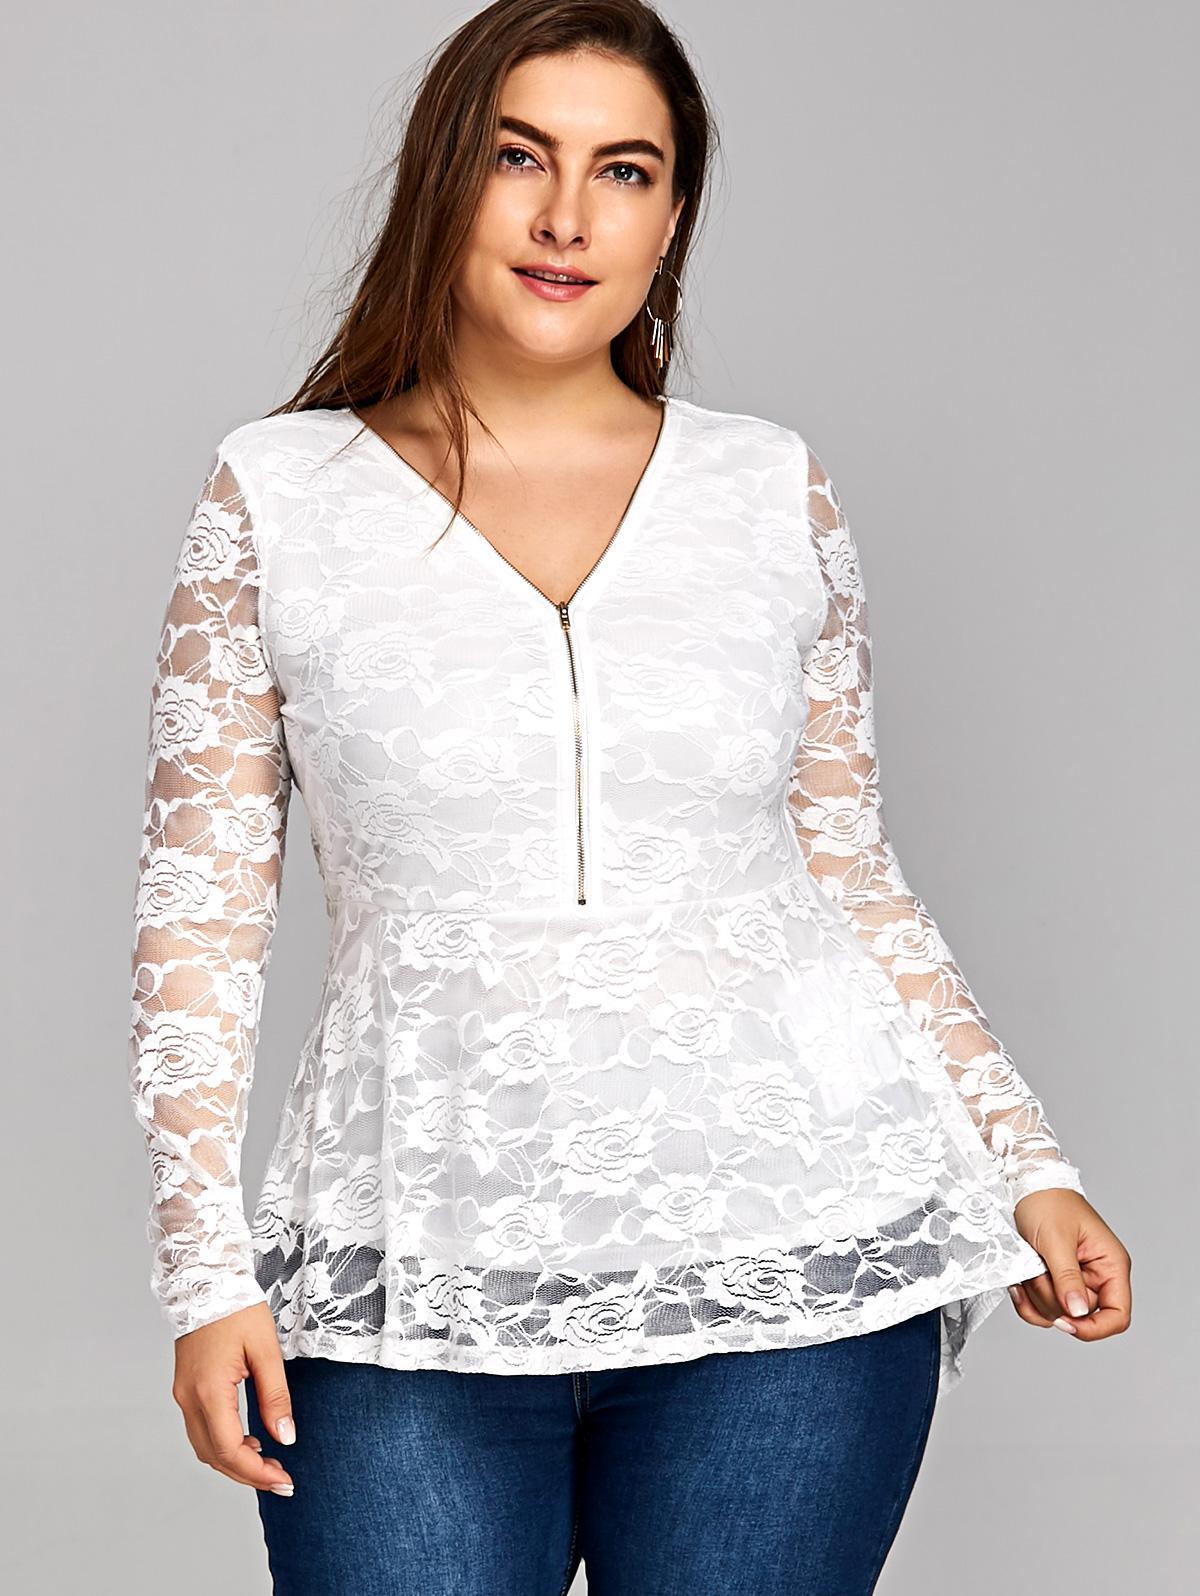 cheap price hot-selling fashion detailed look 2019 AZULINA Plus Size Women Clothing Lace Dip Hem Peplum Top Blouses  Shirts 2018 White Ladies Tops Blusas Big Size Women Blouse 5XL From  Pinkcolor, ...